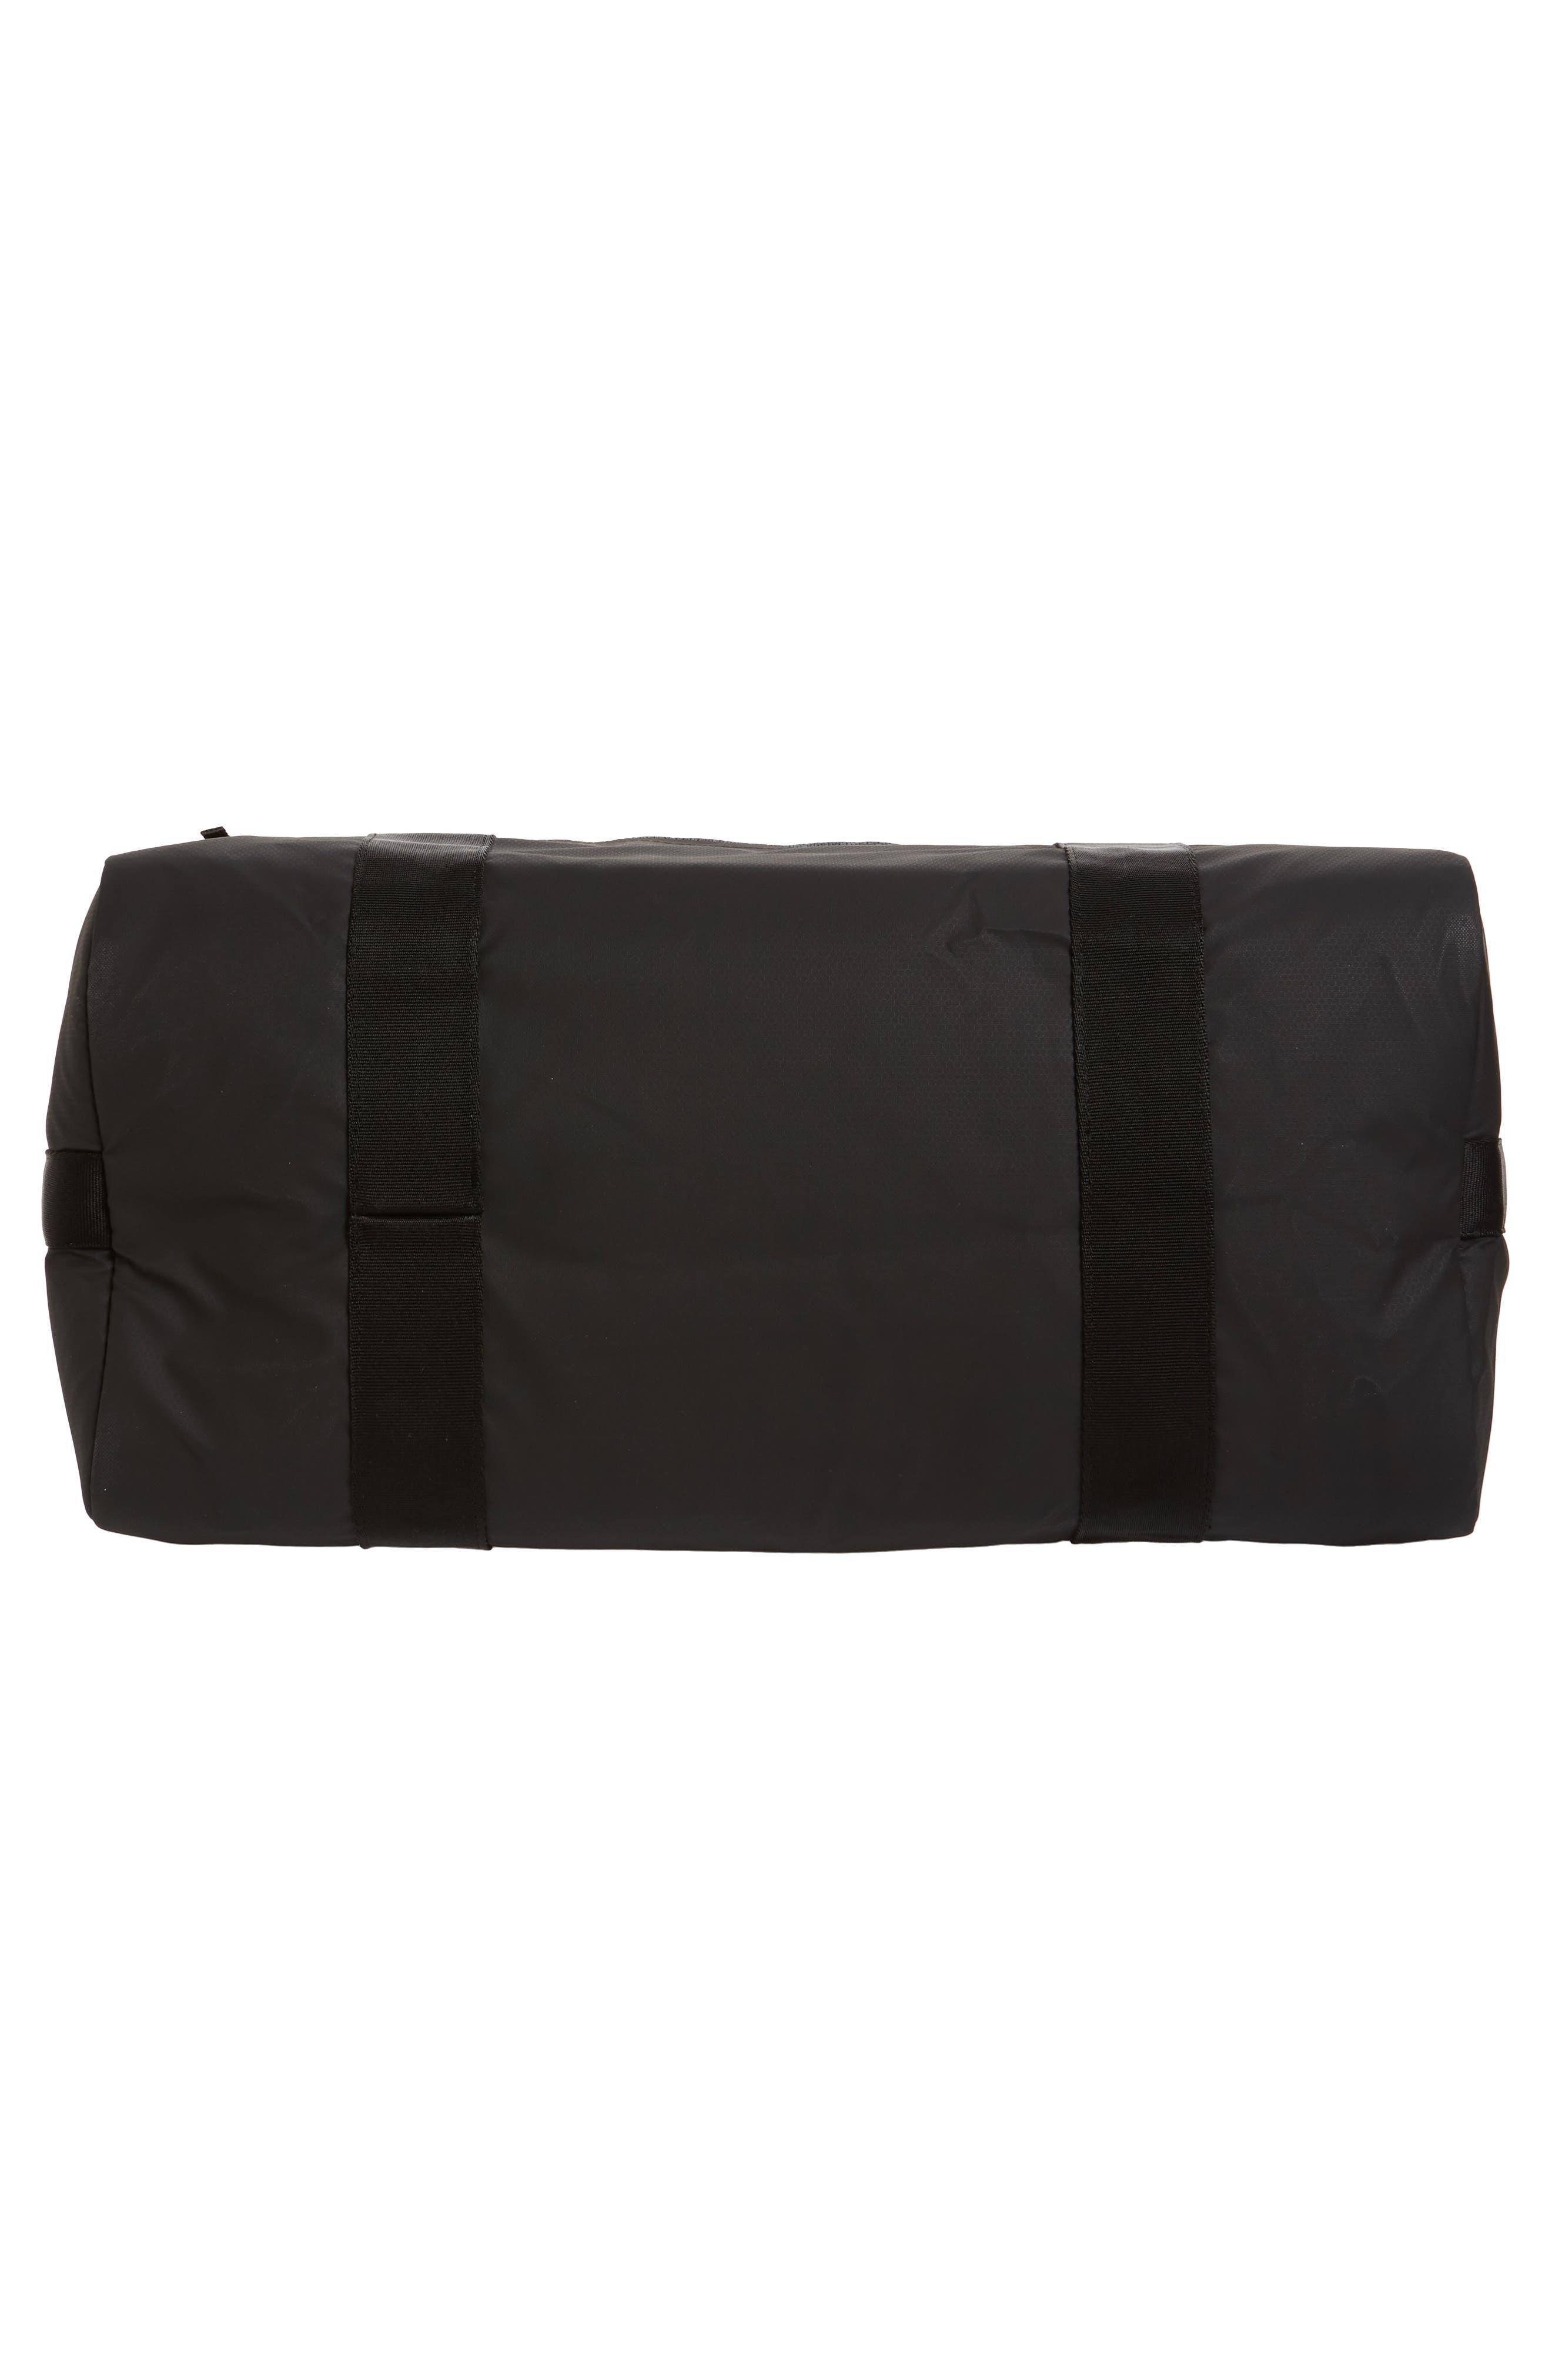 ADIDAS ORIGINALS, PK Amplifier Duffle Bag, Alternate thumbnail 6, color, GREY/ BLACK